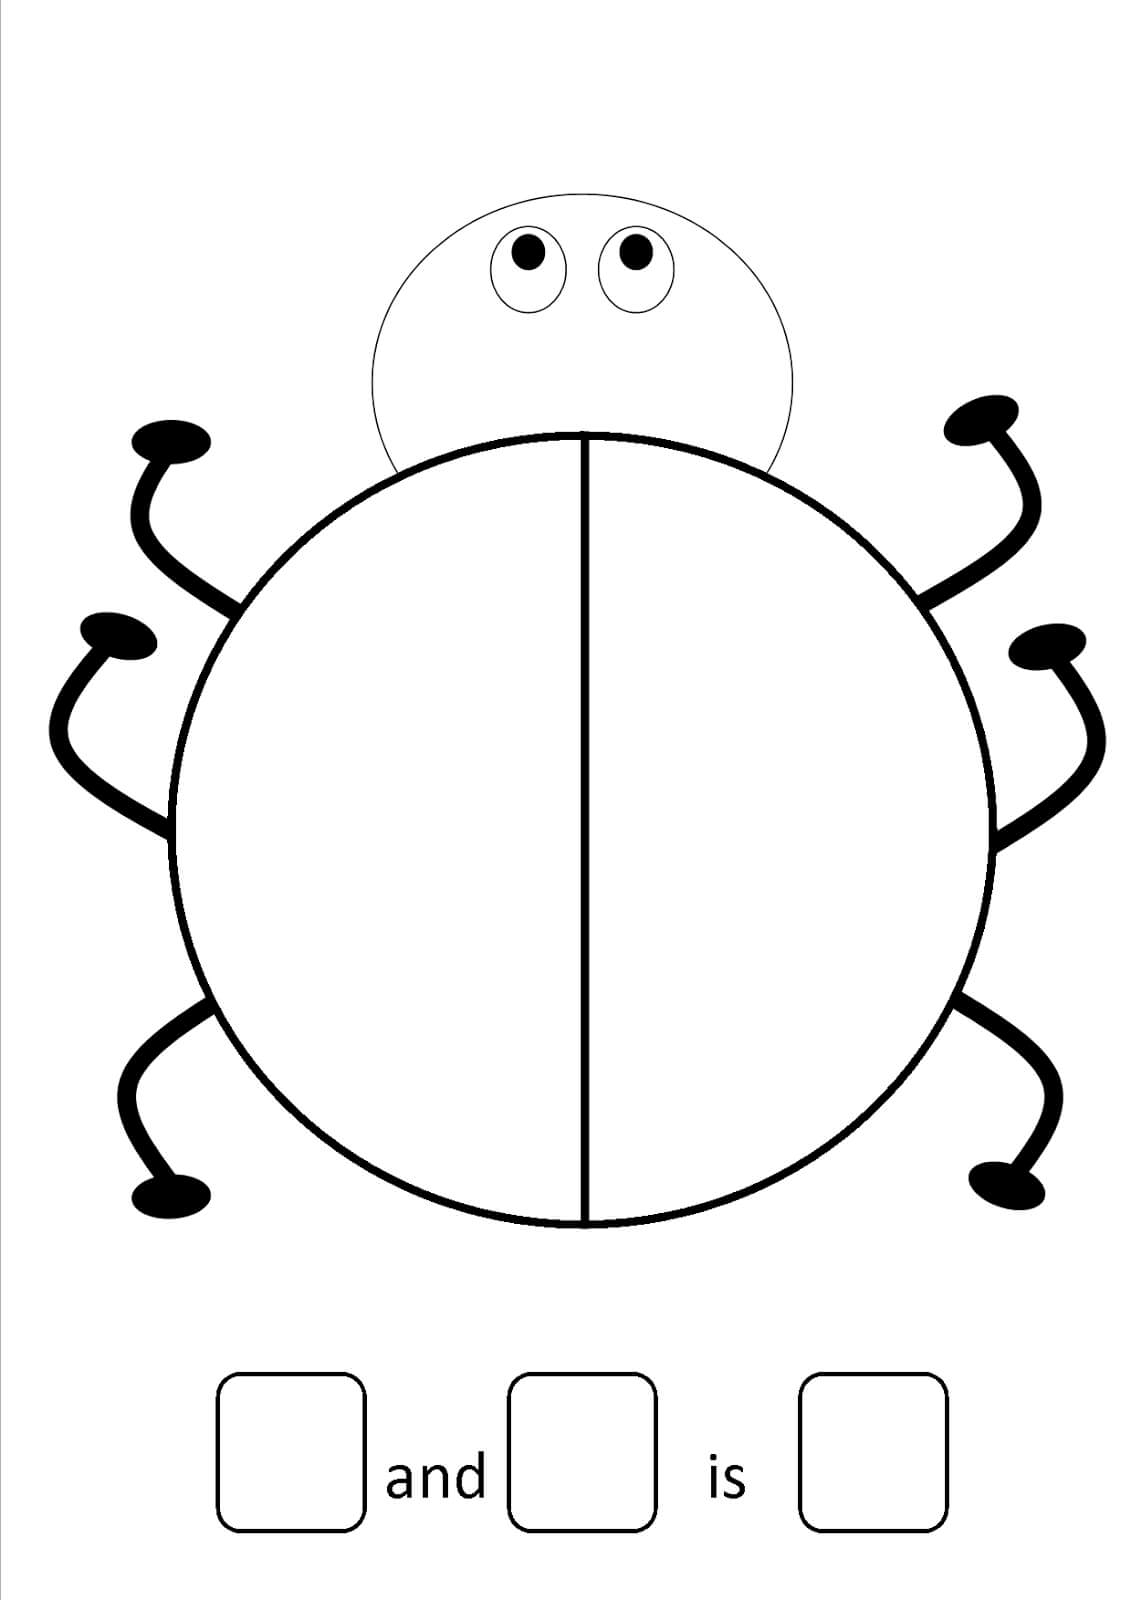 27 Images Of Large Ladybug Template Free   Zeept Regarding Blank Ladybug Template